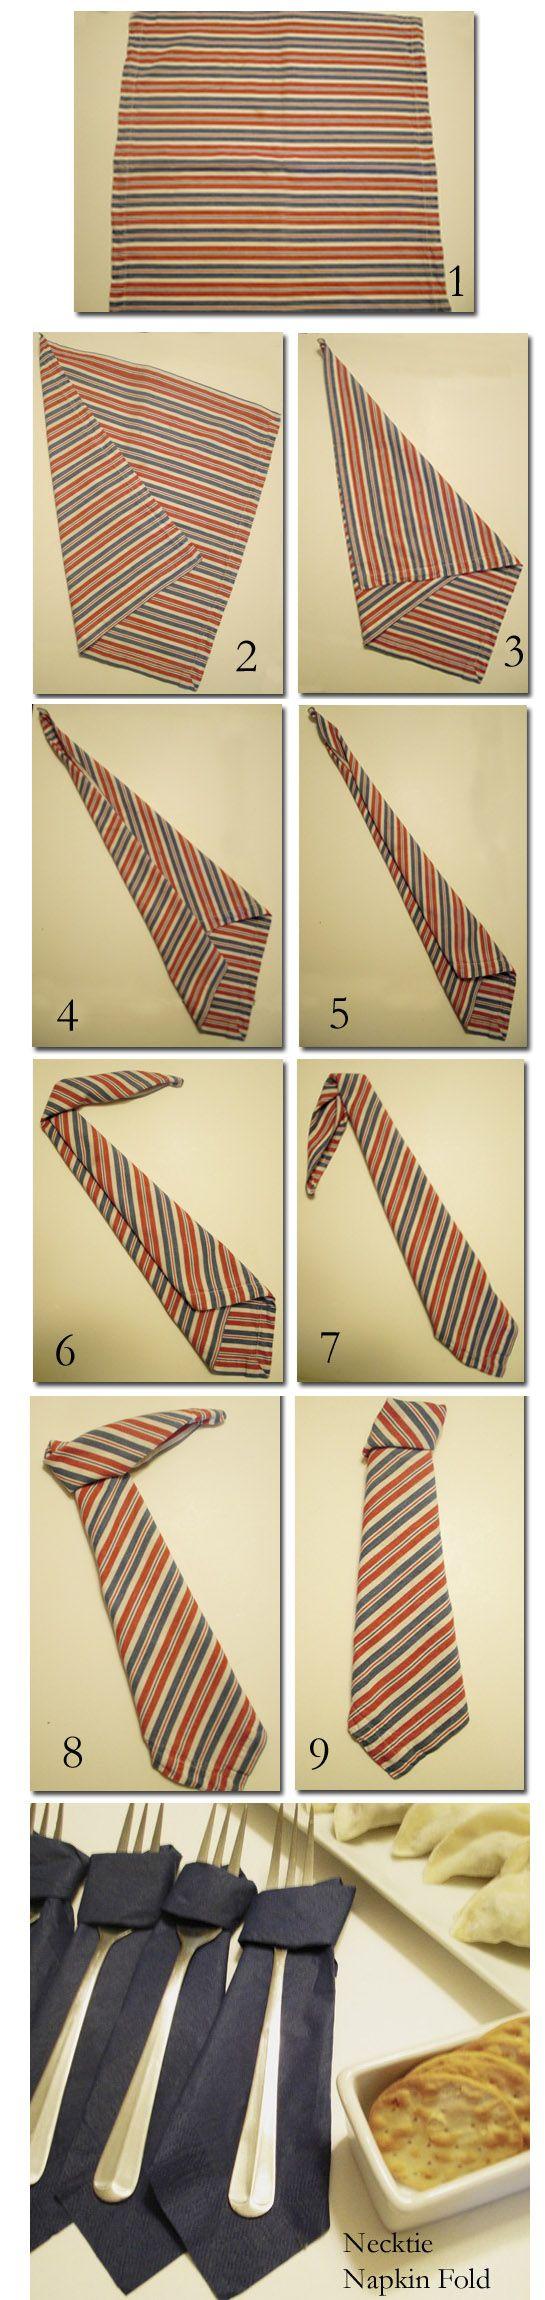 The Tie Fold | Creative Napkin-Folding Techniques